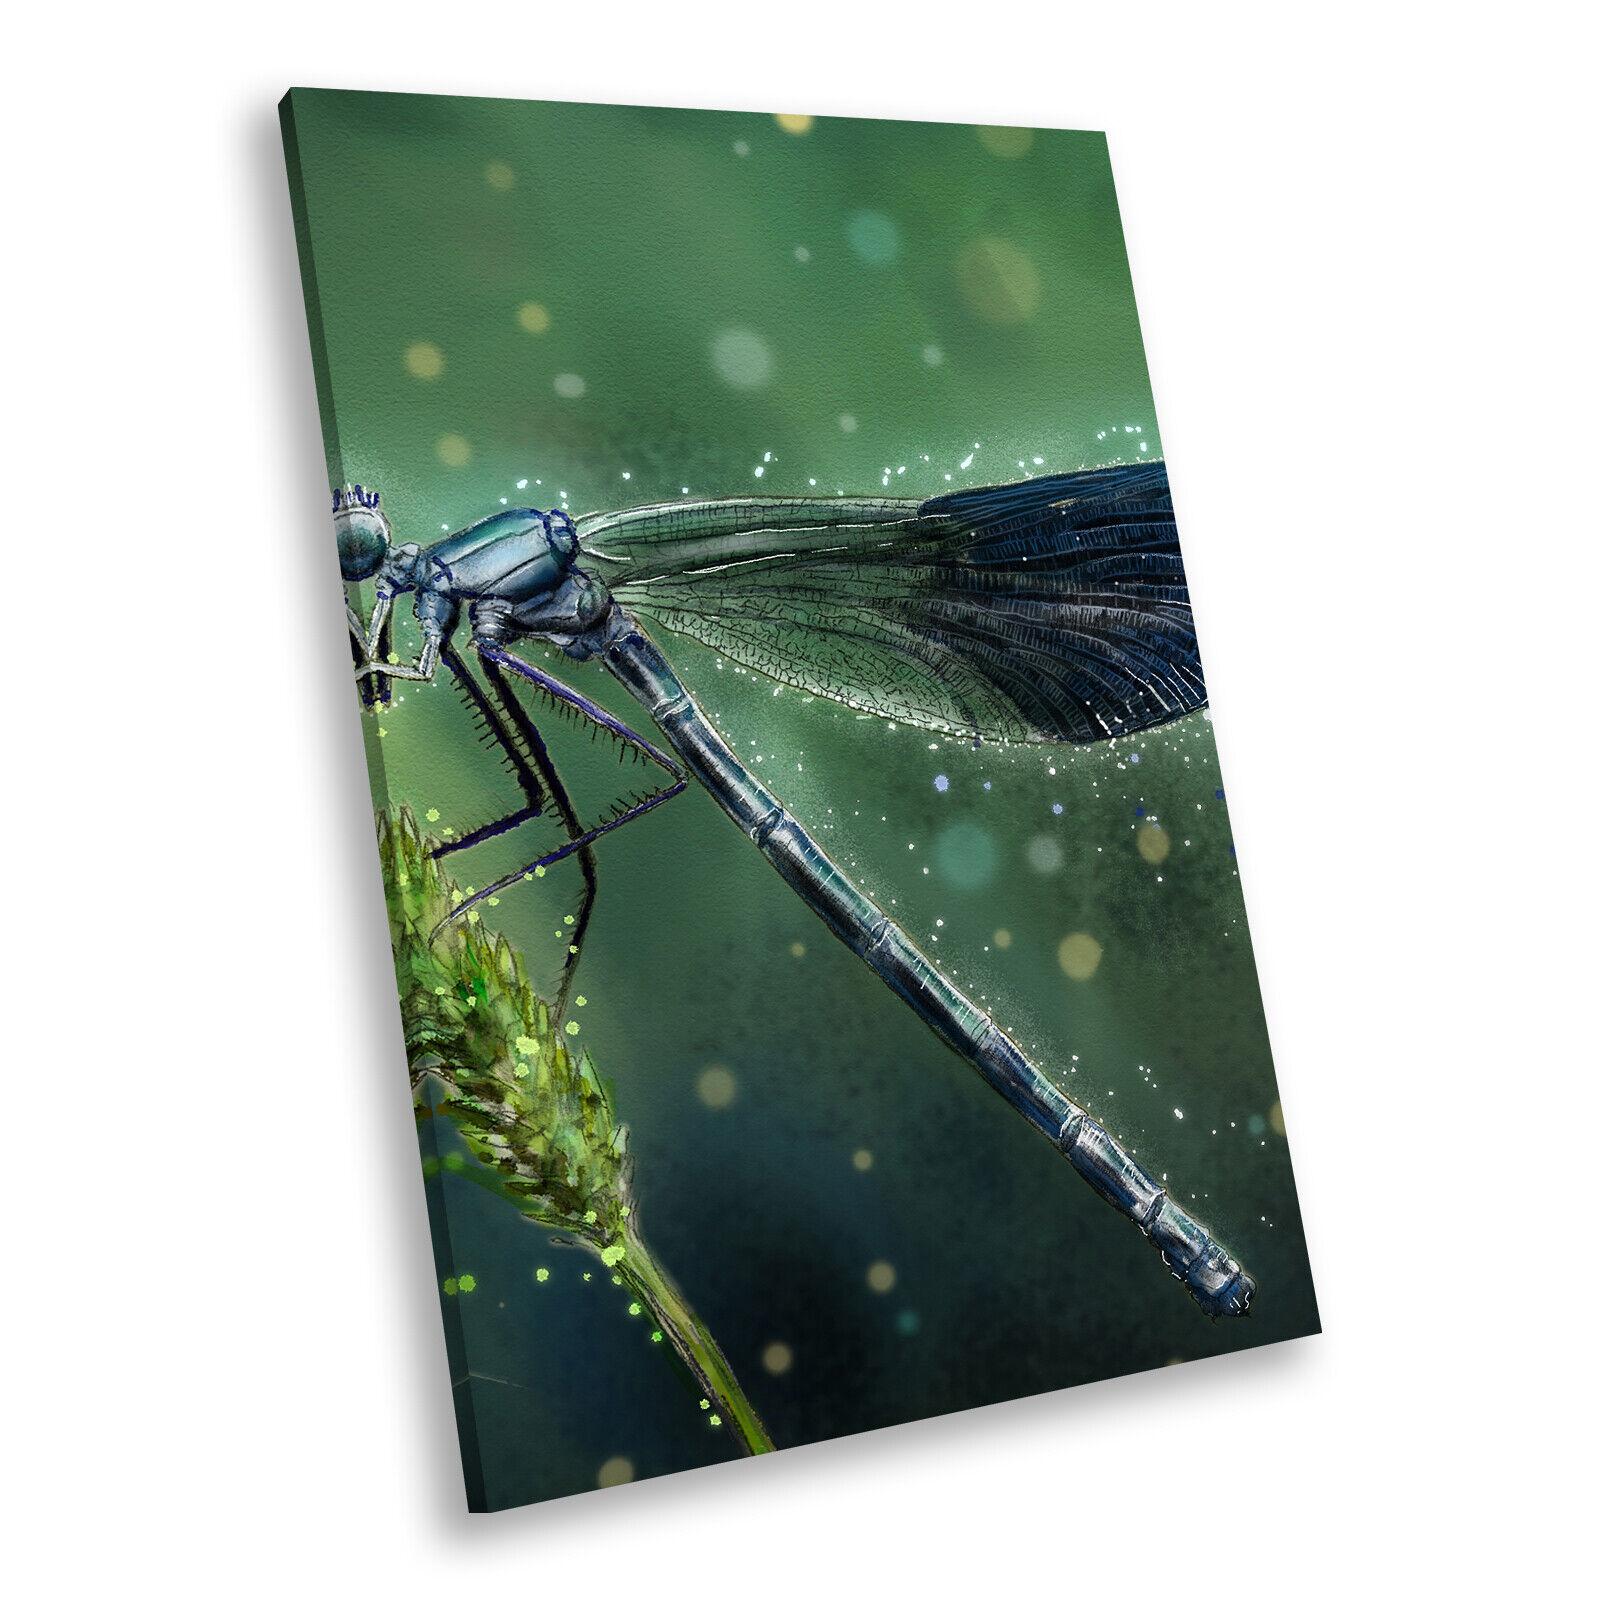 Blau Dragonfly Grün Light Portrait Animal Canvas Wall Art Picture Prints